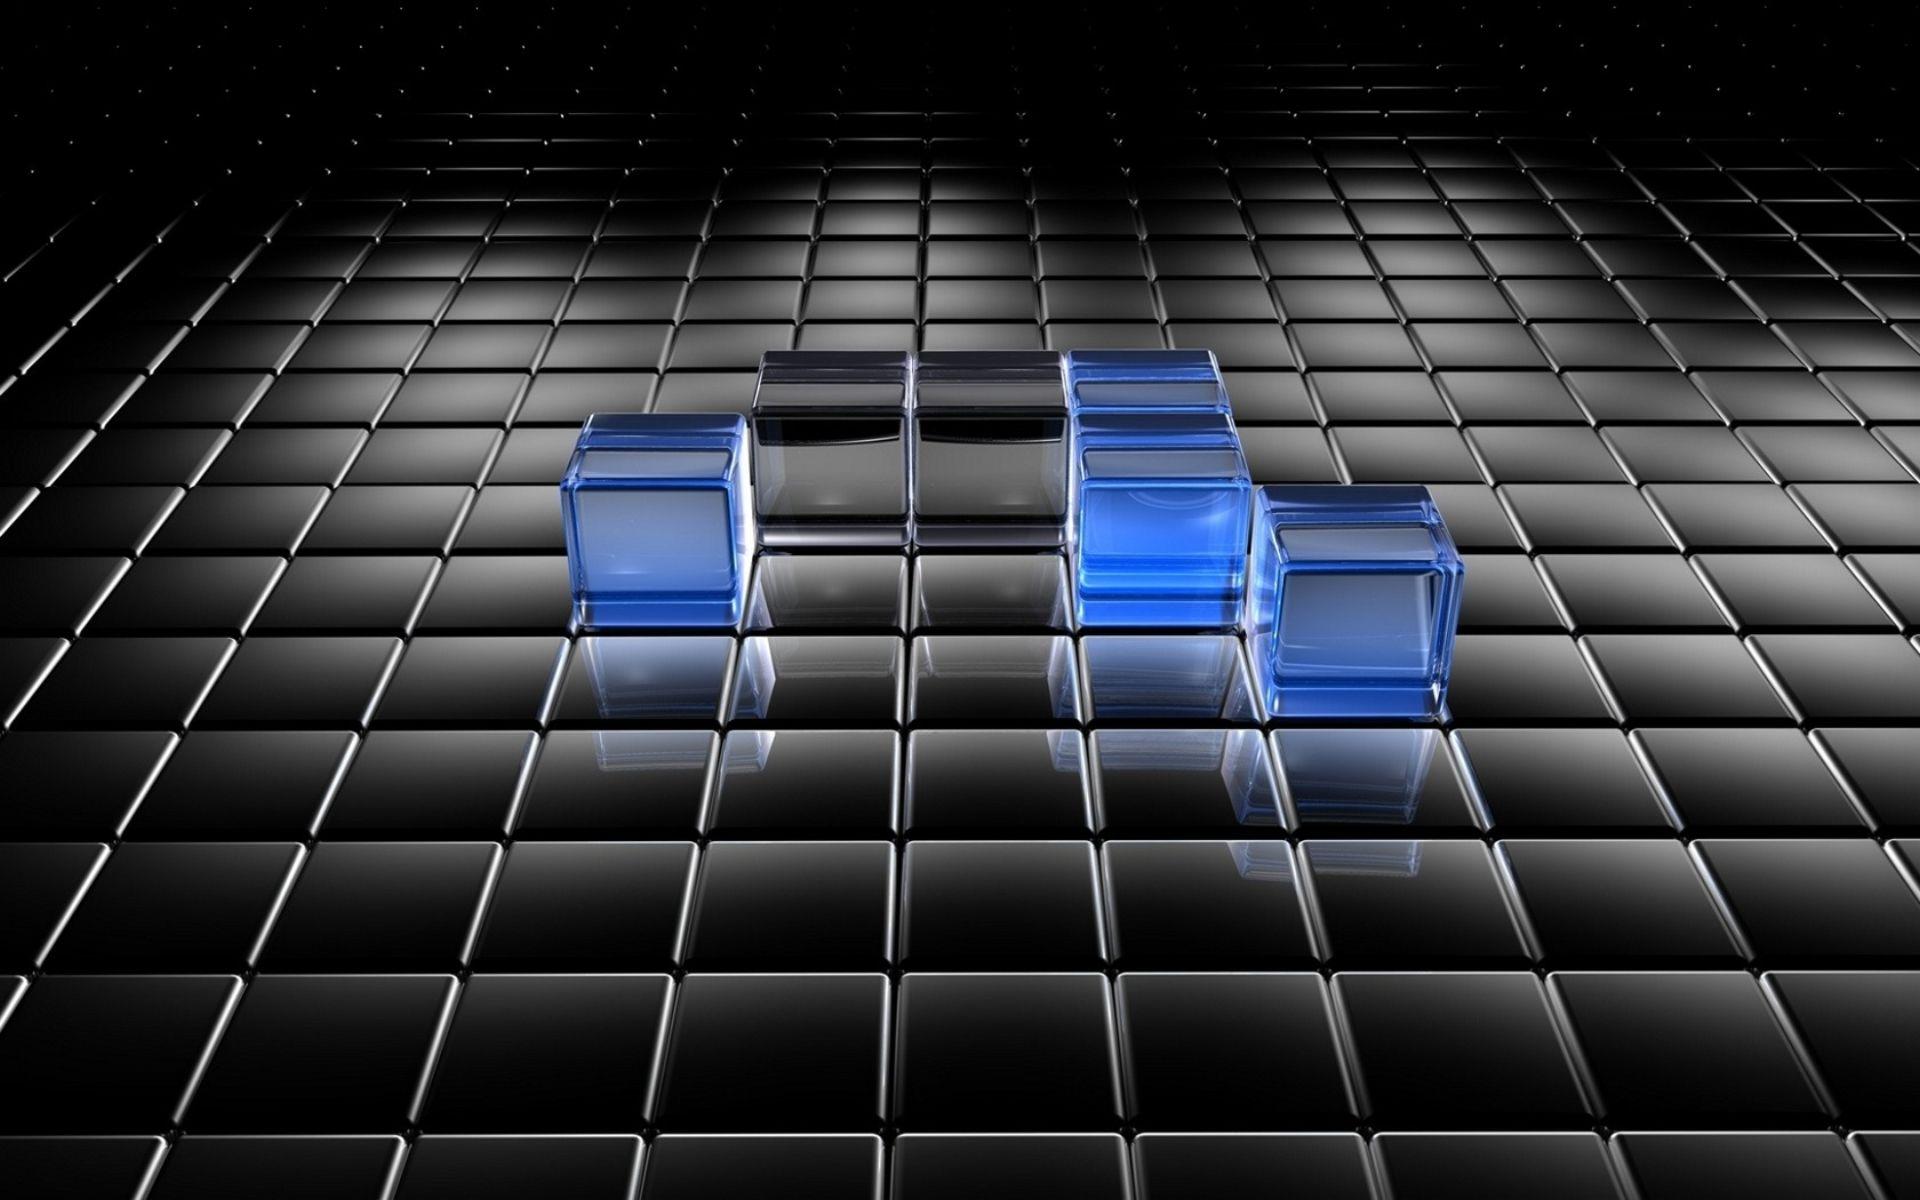 Download Desktop 3d Wallpapers 3d Blue And Black Graph Wallpapers 1920x1200 209617